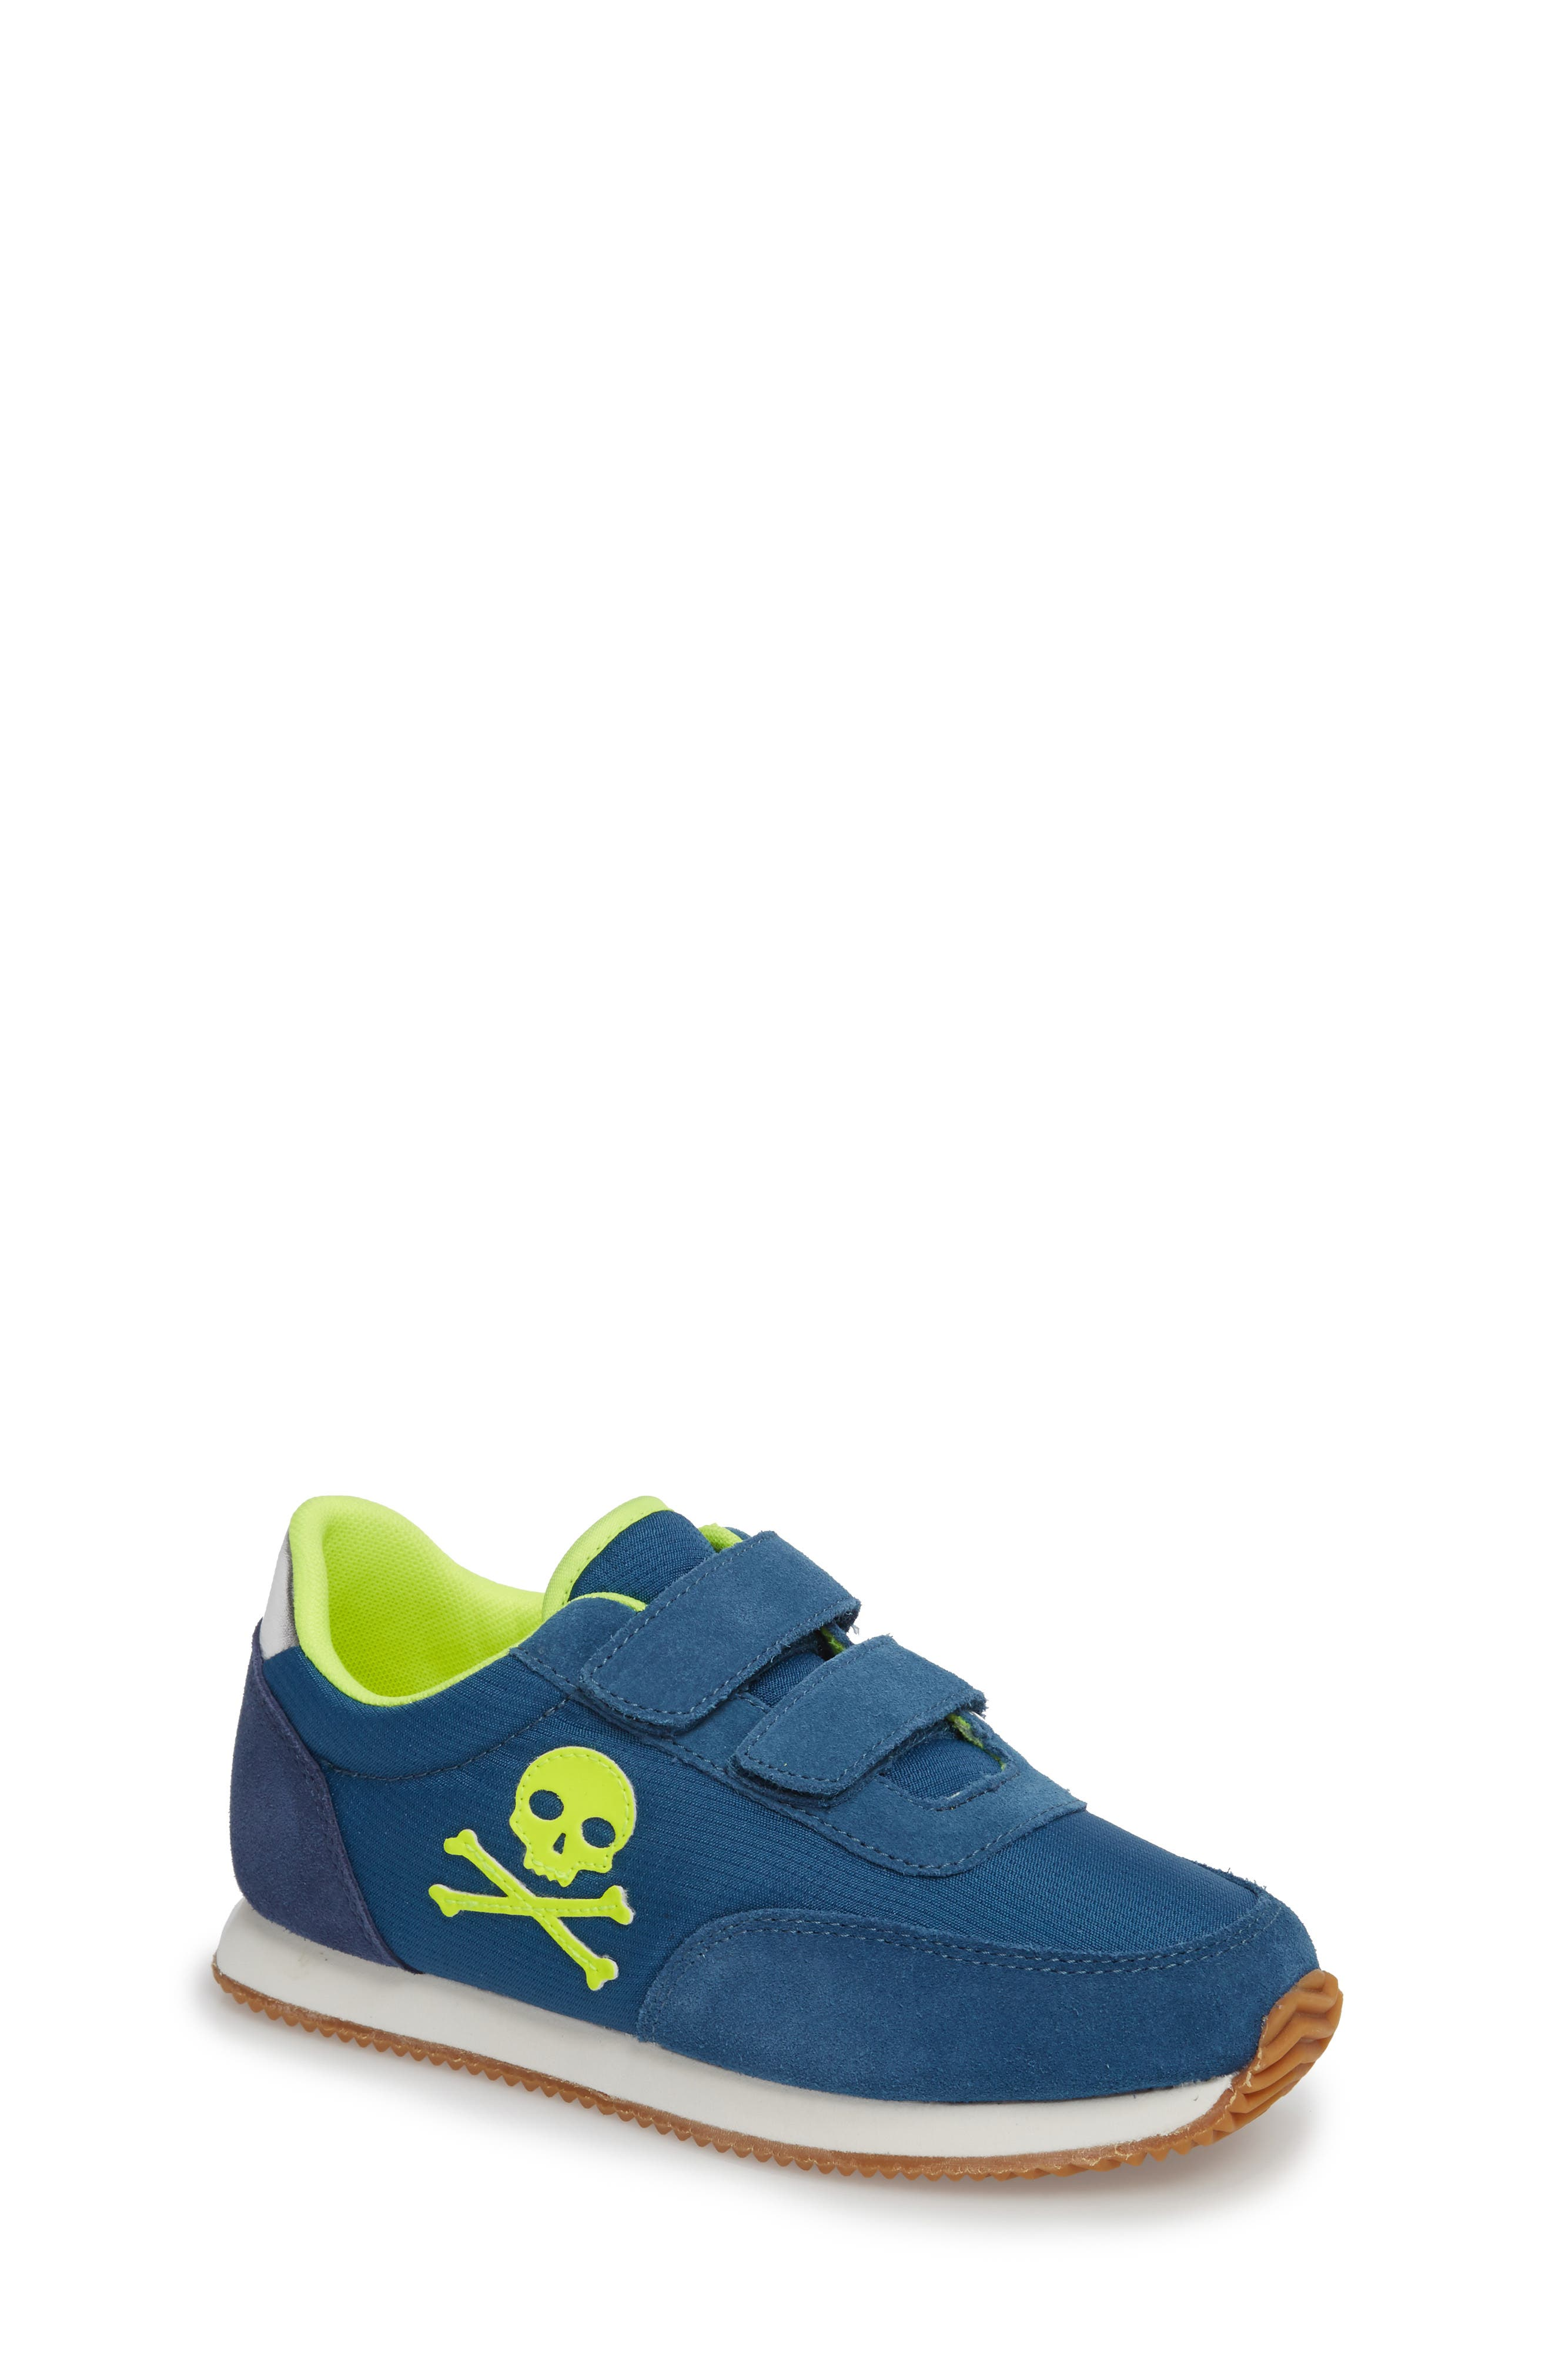 Main Image - Mini Boden Print Sneakers (Toddler, Little Kid & Big Kid)